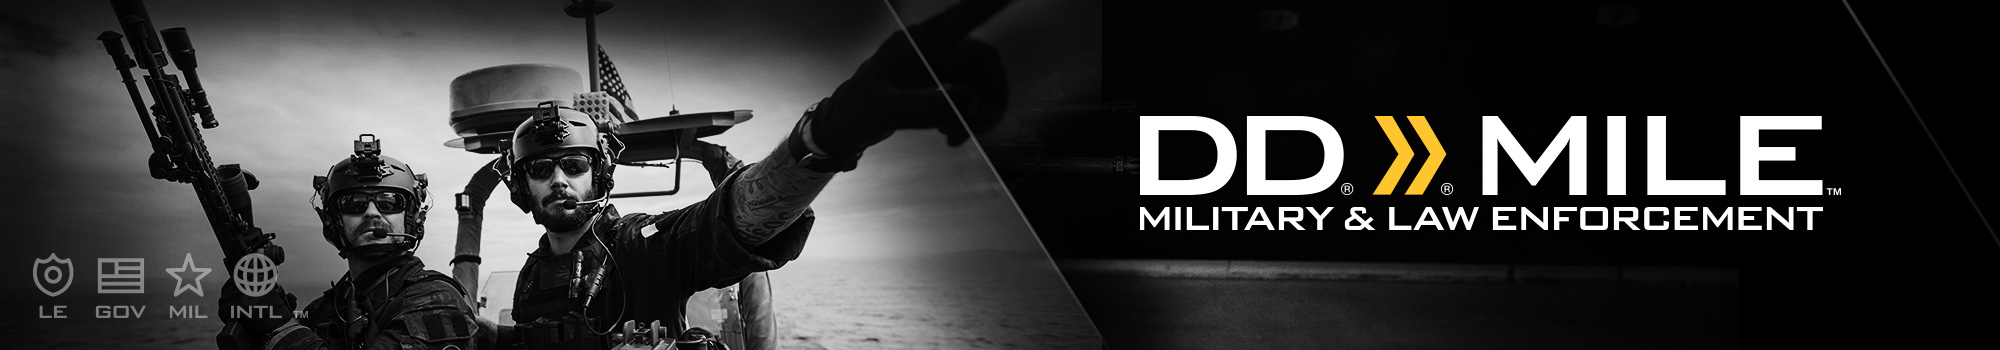 DD Mile Program for Military & Law Enforcement